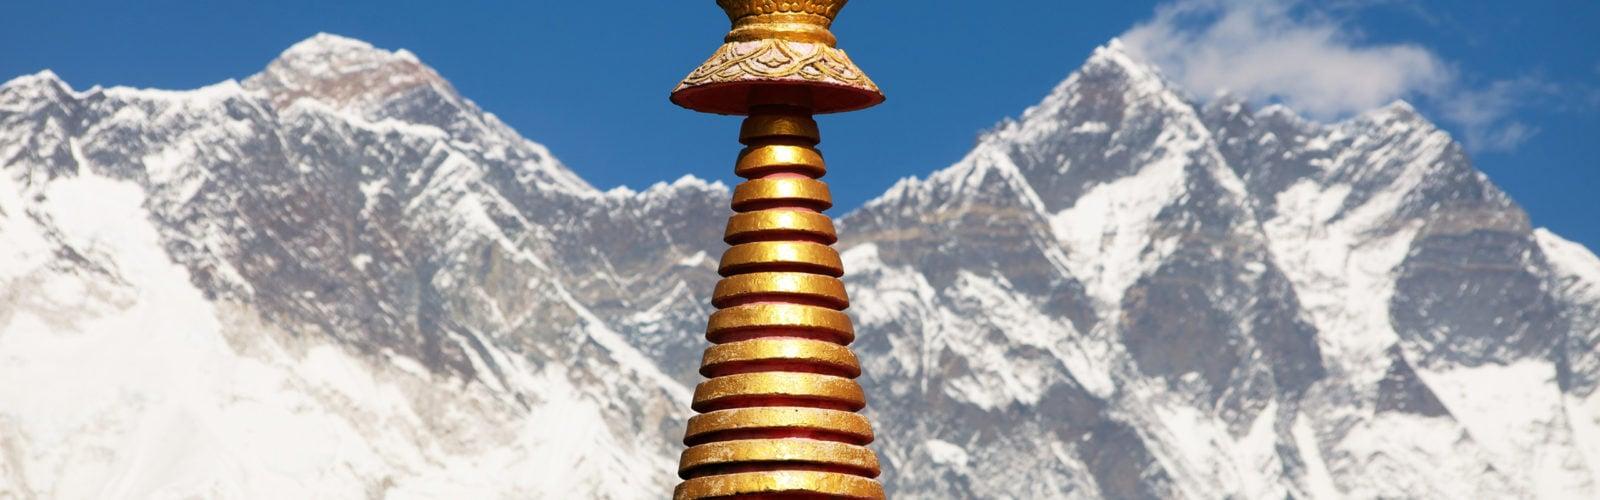 tengboche-nepal